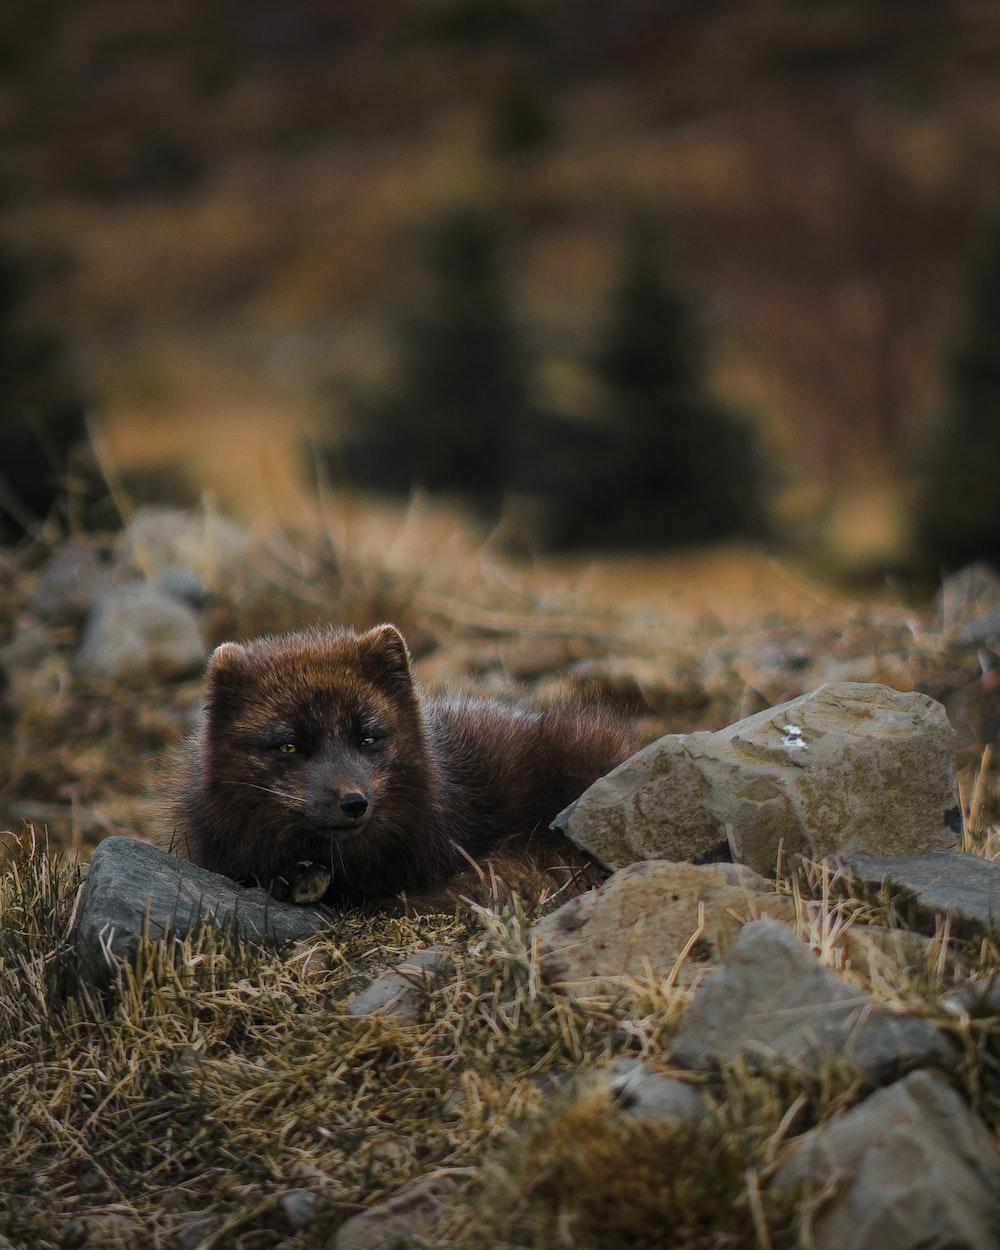 short fur brown animal reclining near rocks